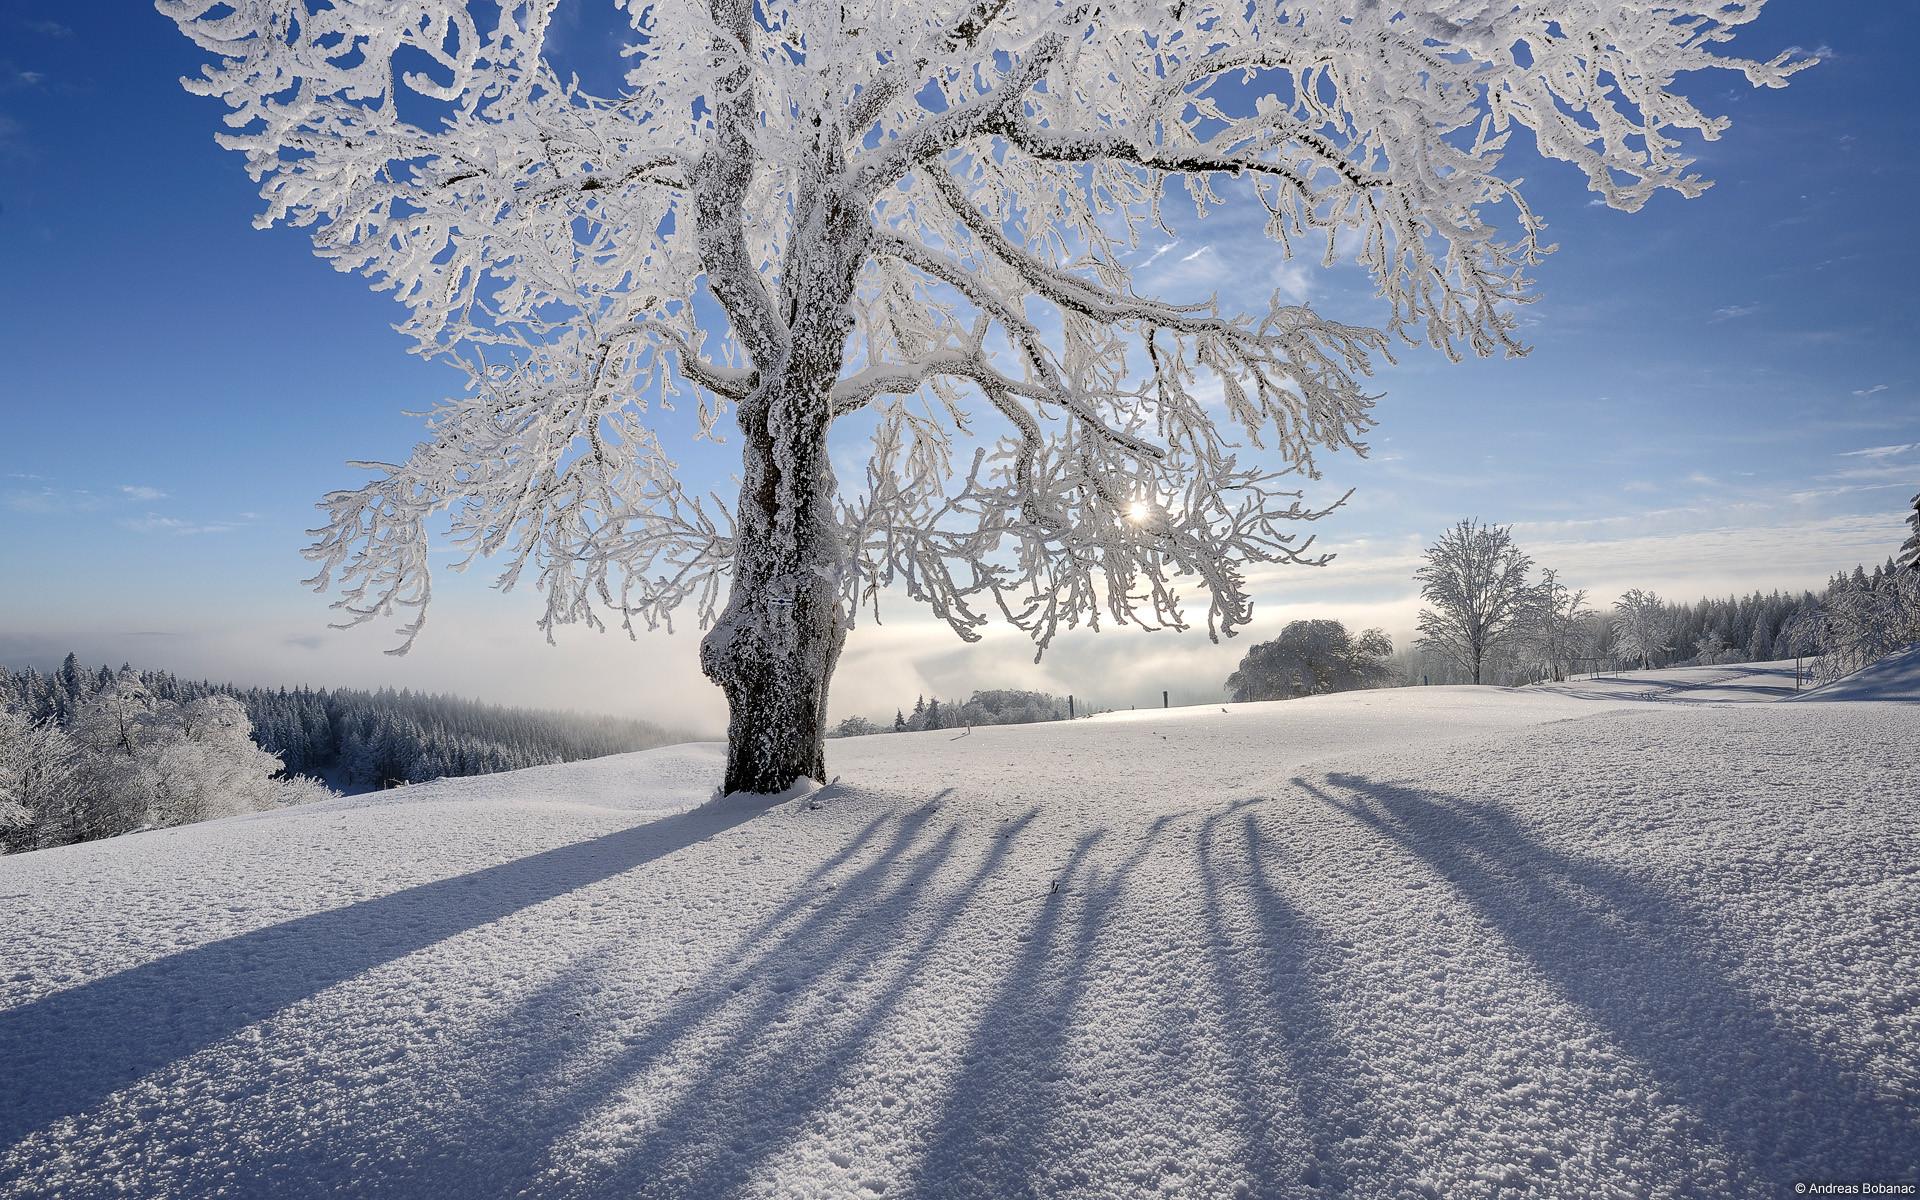 Winter snow scenes wallpaper 49 images 1920x1080 1080p snow scenes vol2 no13 19201080 picrolls free wallpaper voltagebd Choice Image